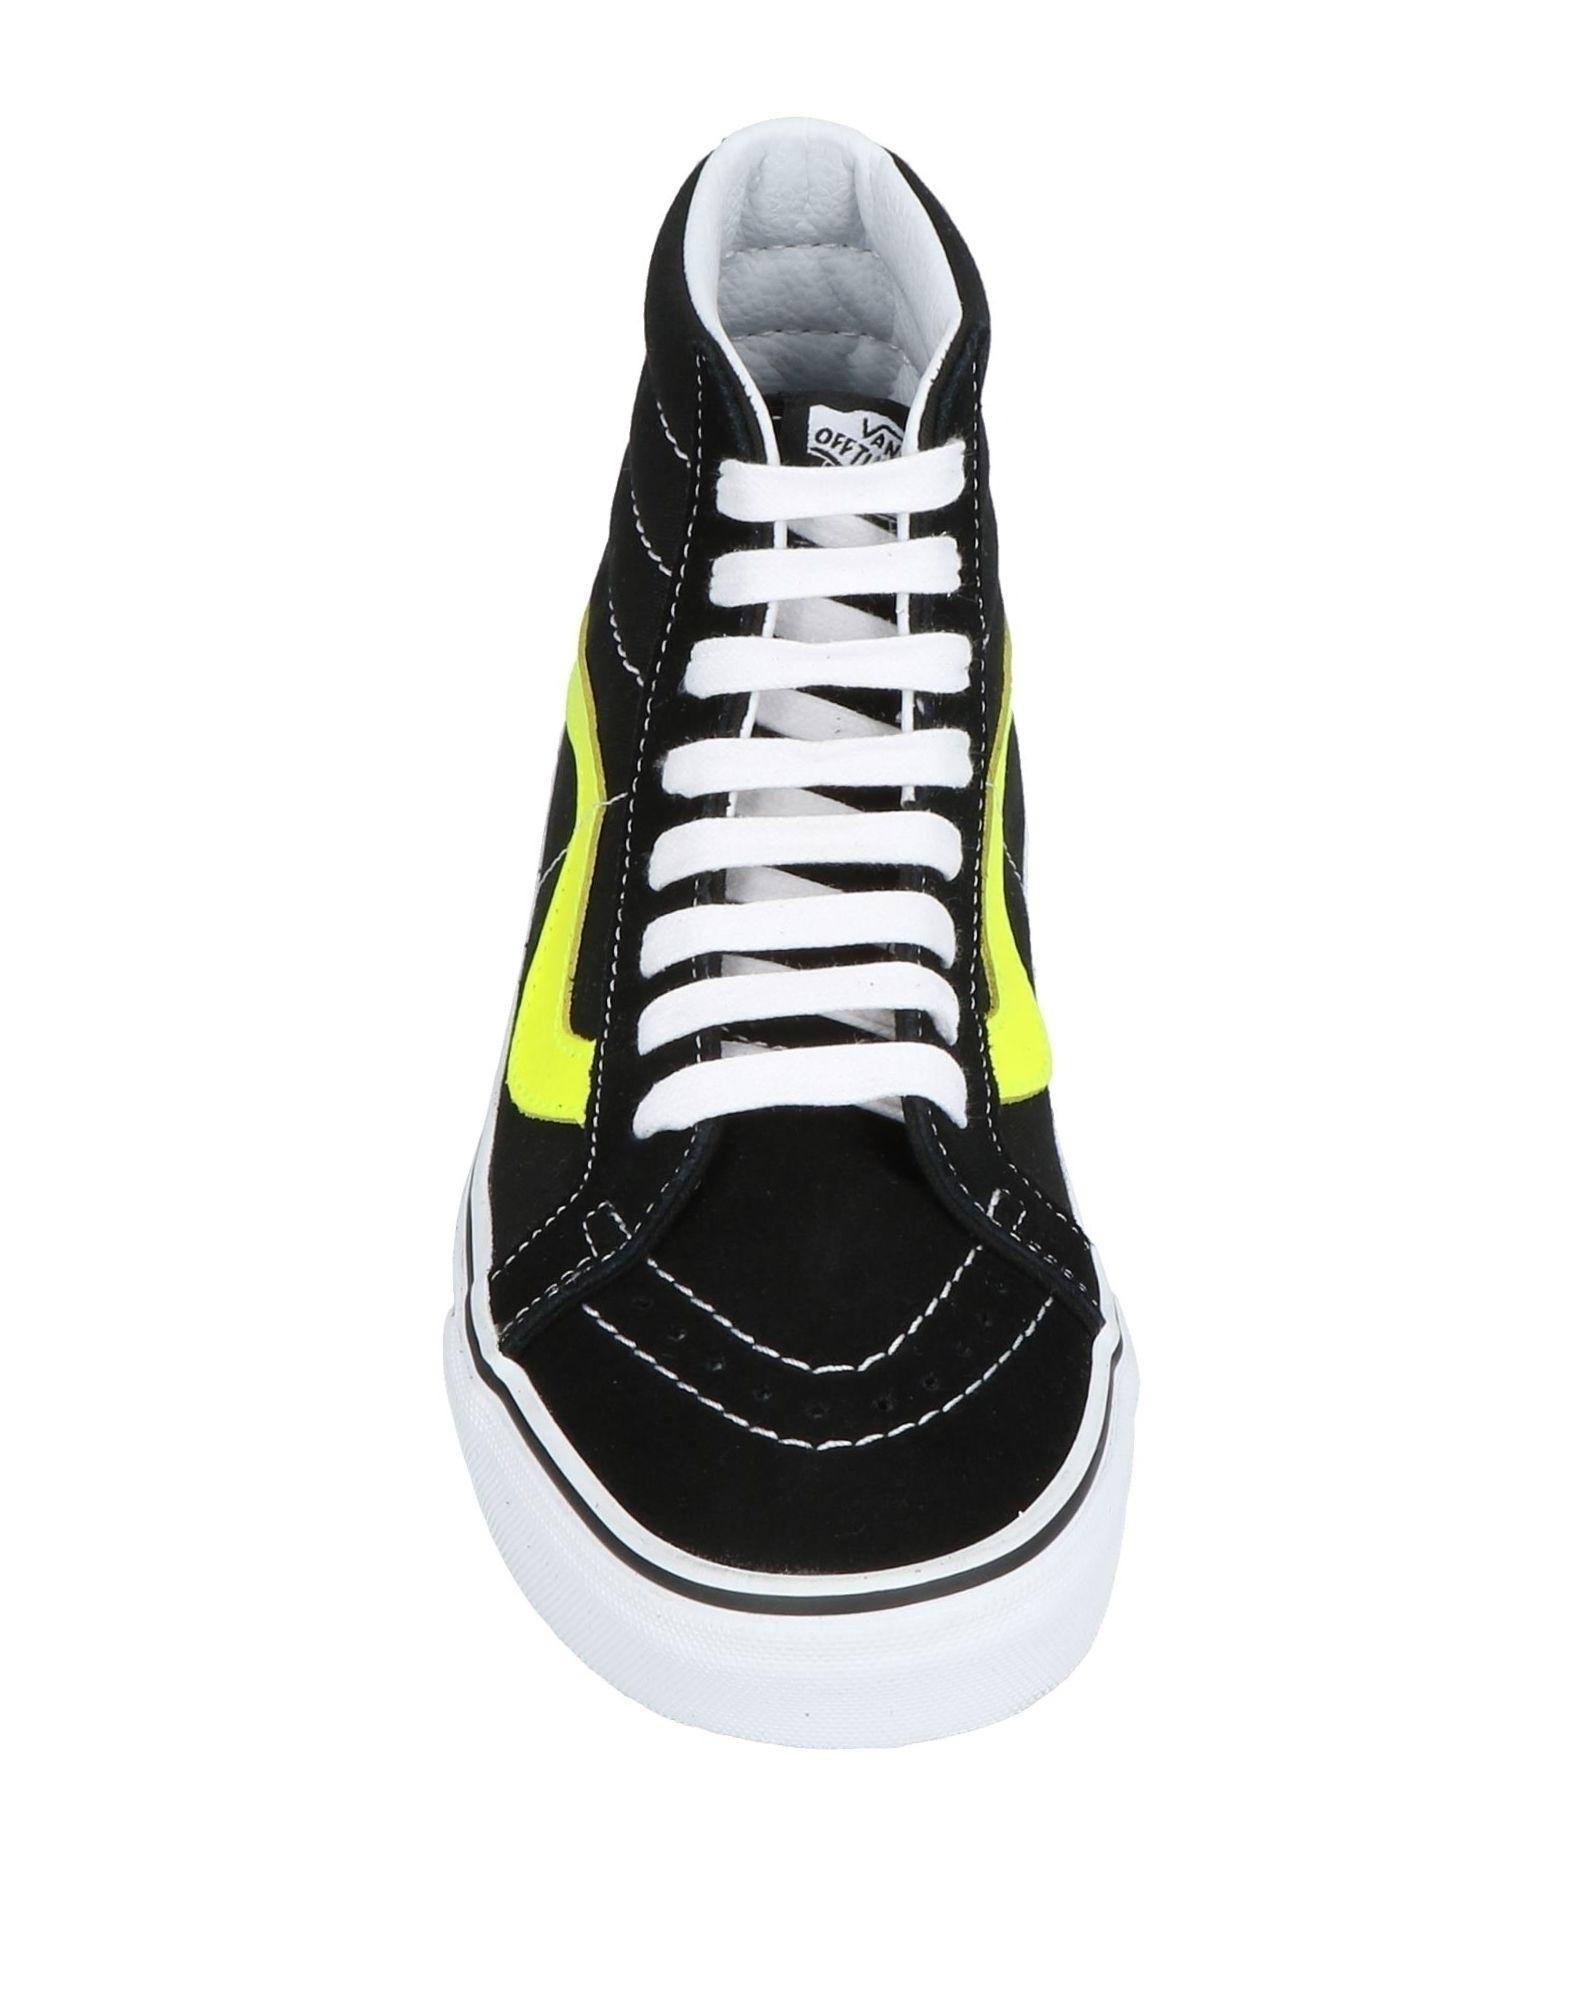 Vans Sneakers Damen 11429115UR  11429115UR Damen Gute Qualität beliebte Schuhe 192ed3